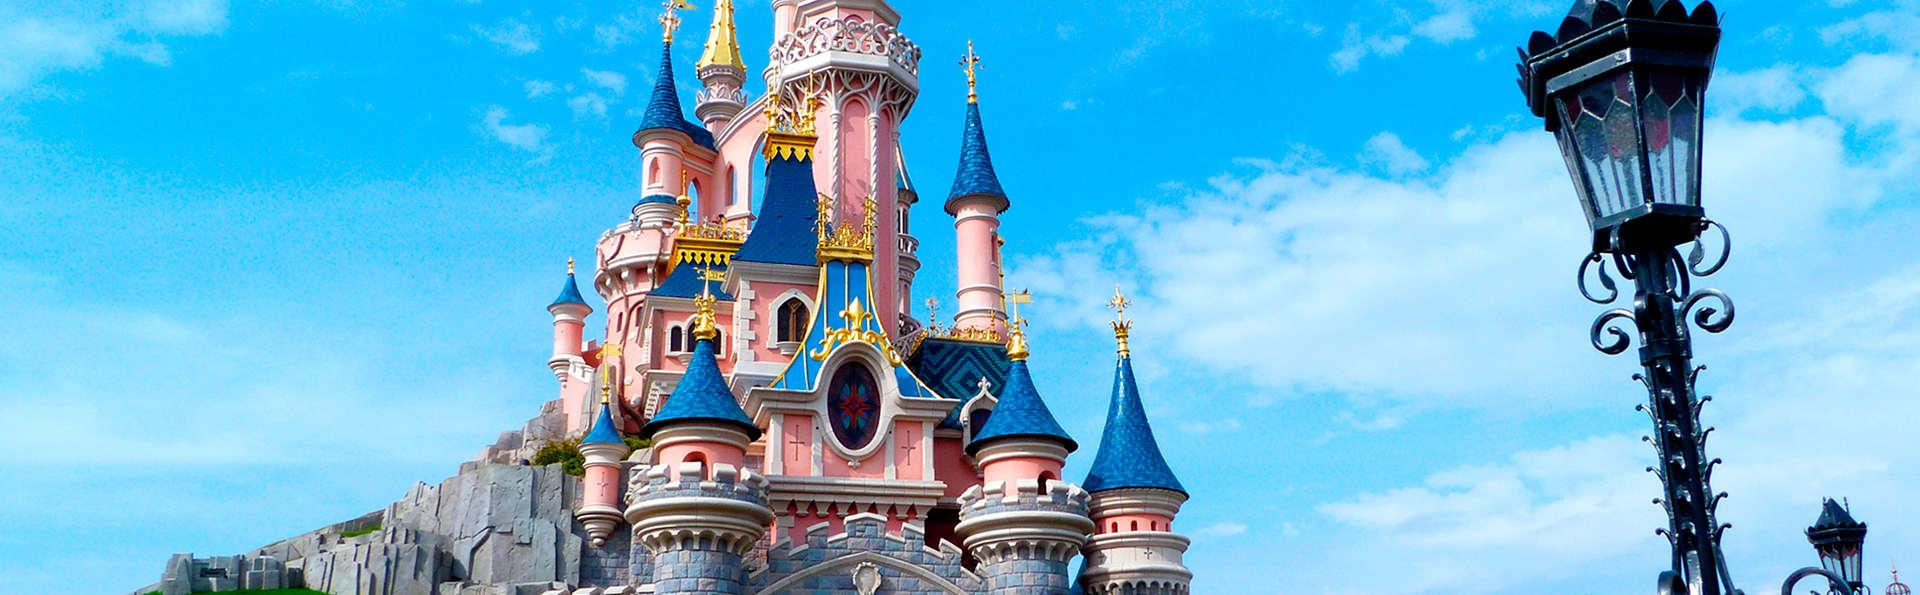 Weekend met toegang tot Disneyland® (2 tot 4 personen)